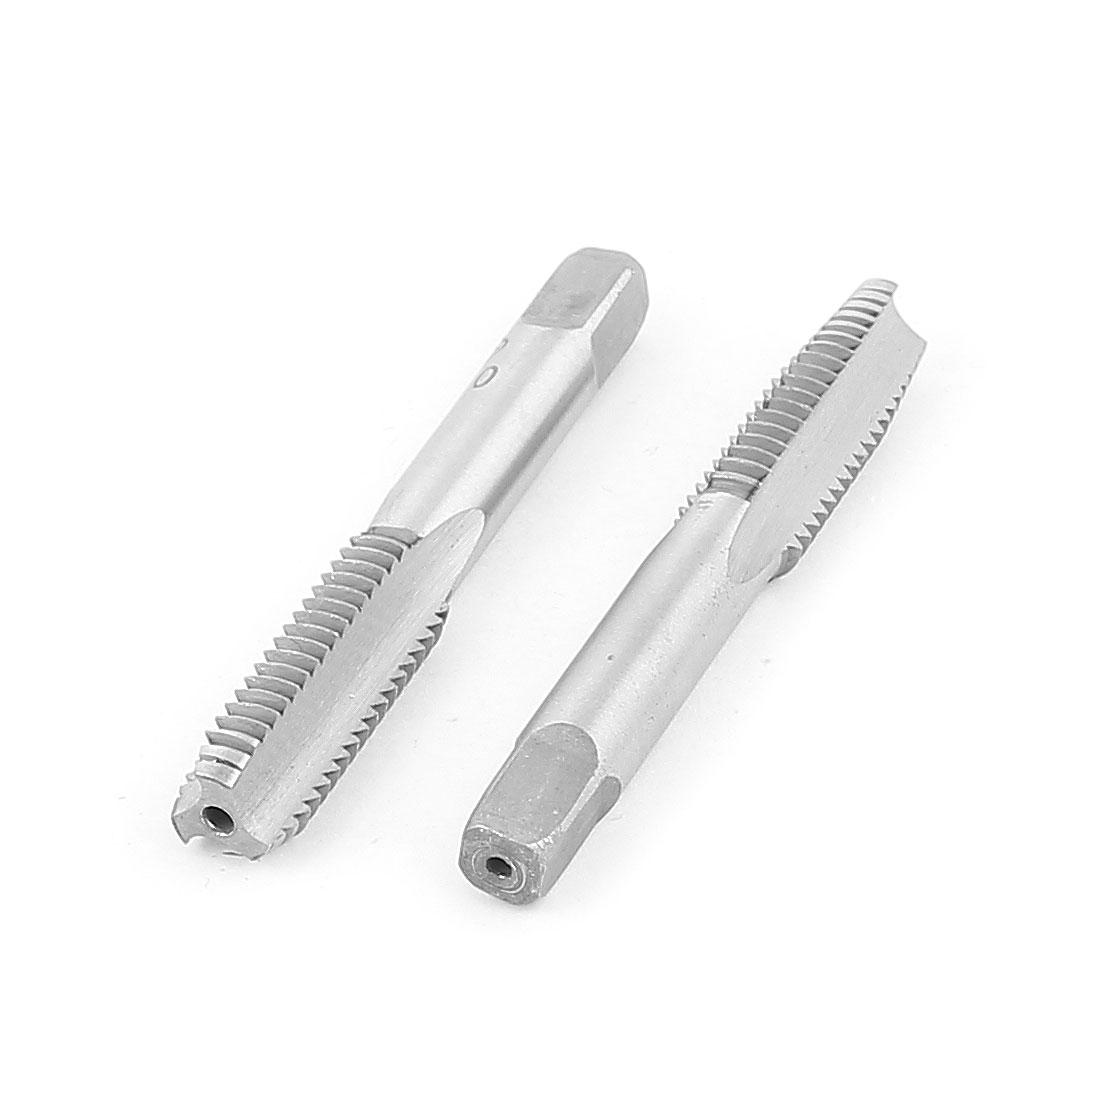 M10 3 Flutes Straight Shank Threading Tool Metric HSS Hand Plug Tap 2Pcs